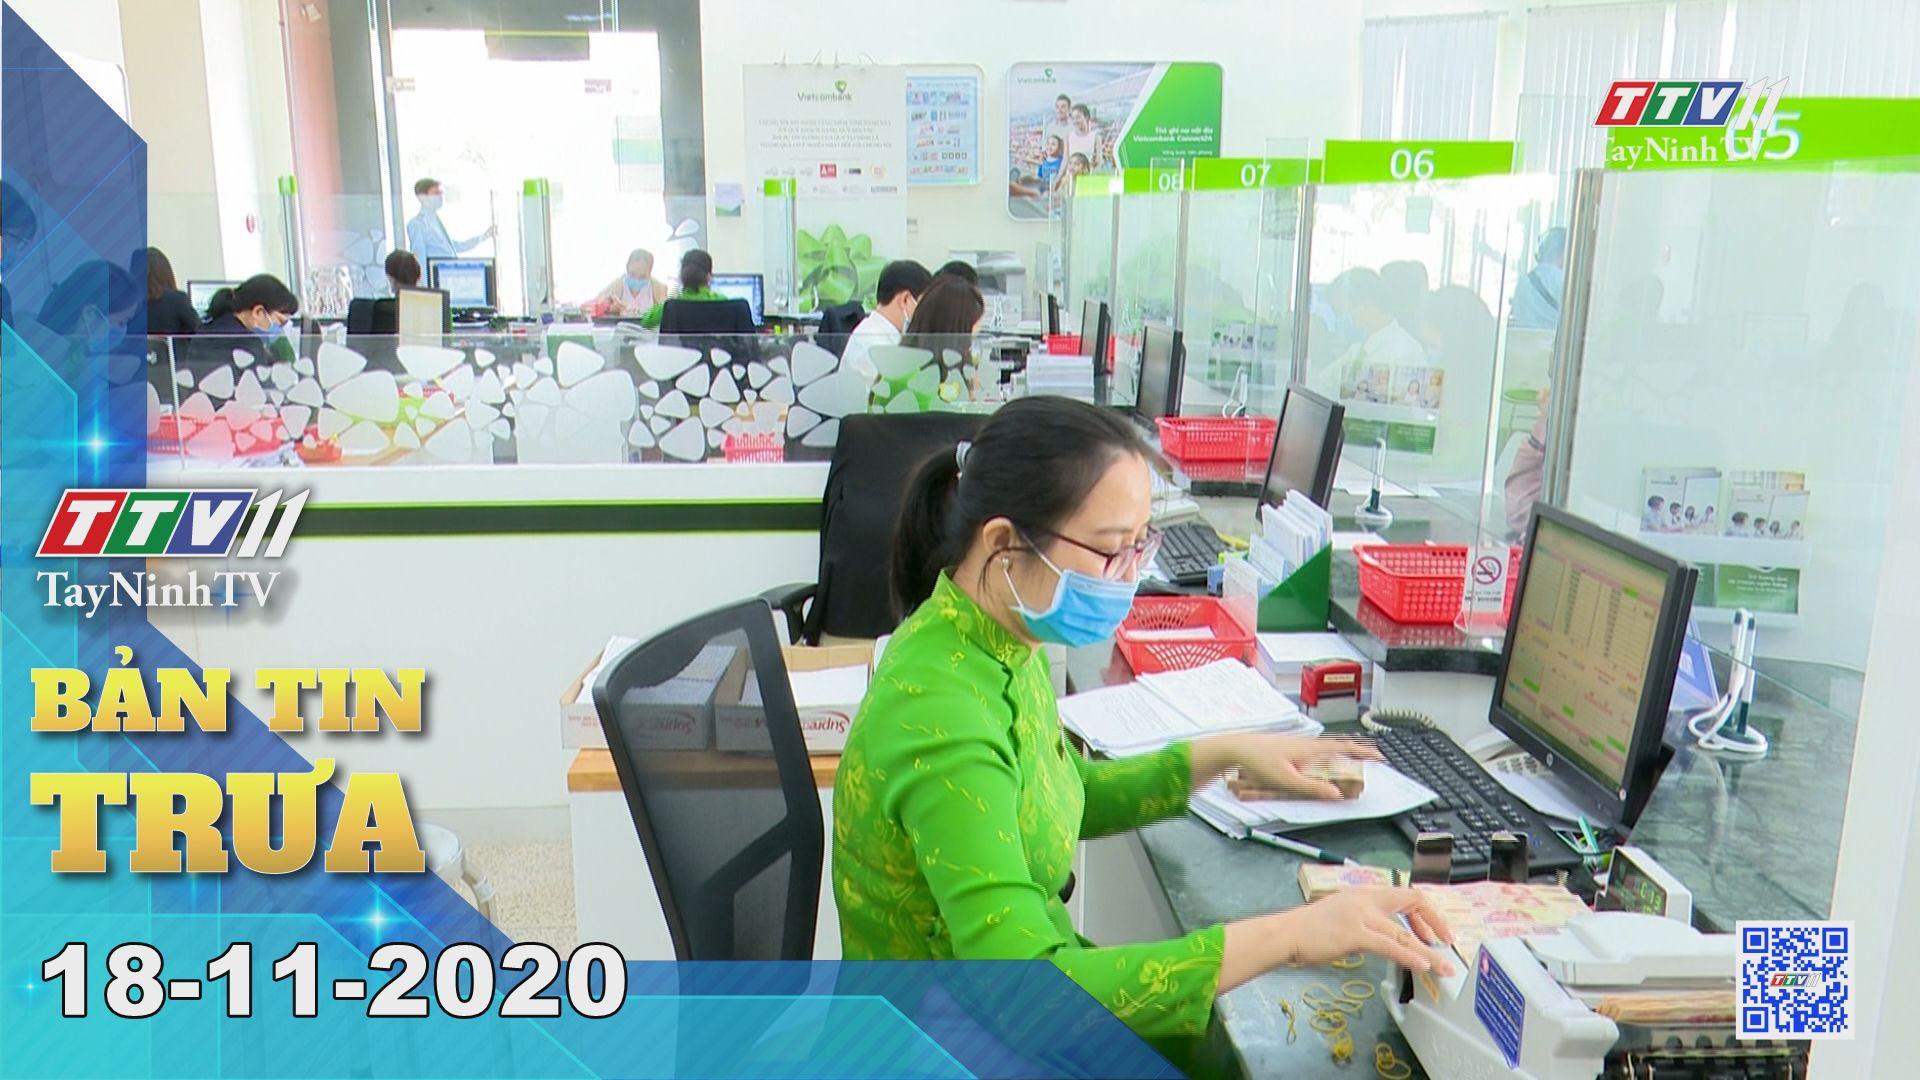 Bản tin trưa 18-11-2020 | Tin tức hôm nay | TayNinhTV